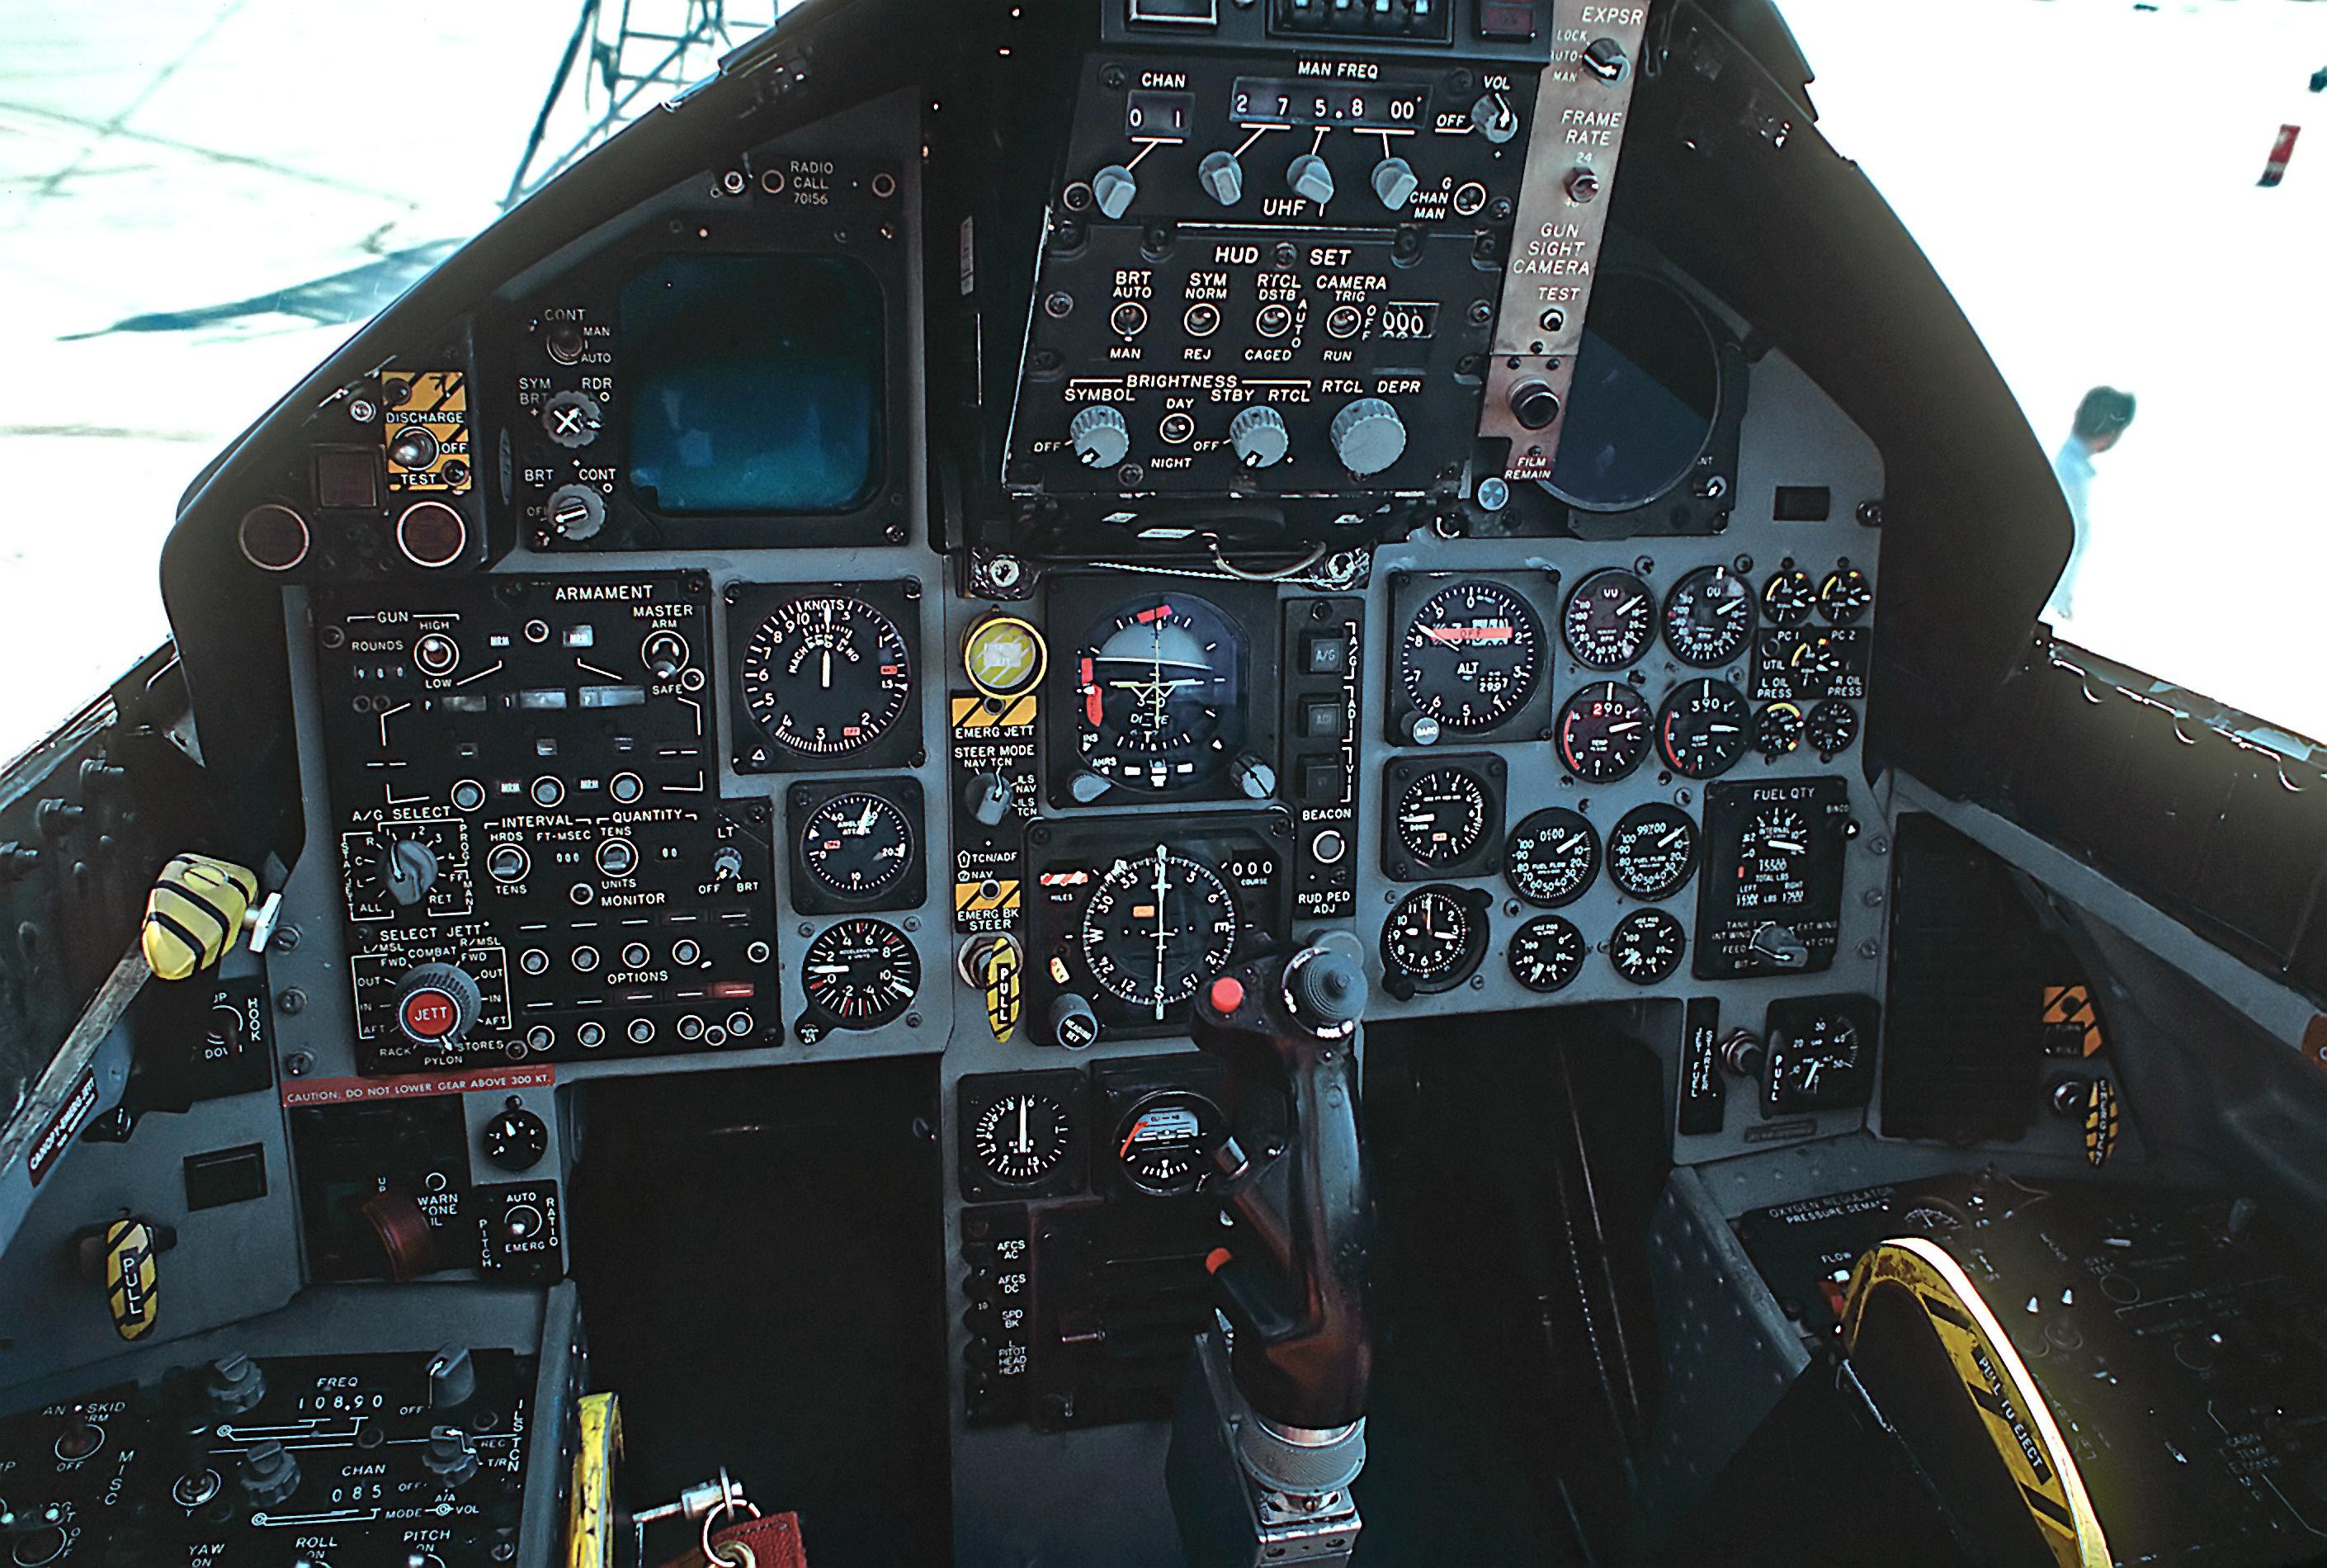 Description F-1... F 15 Cockpit